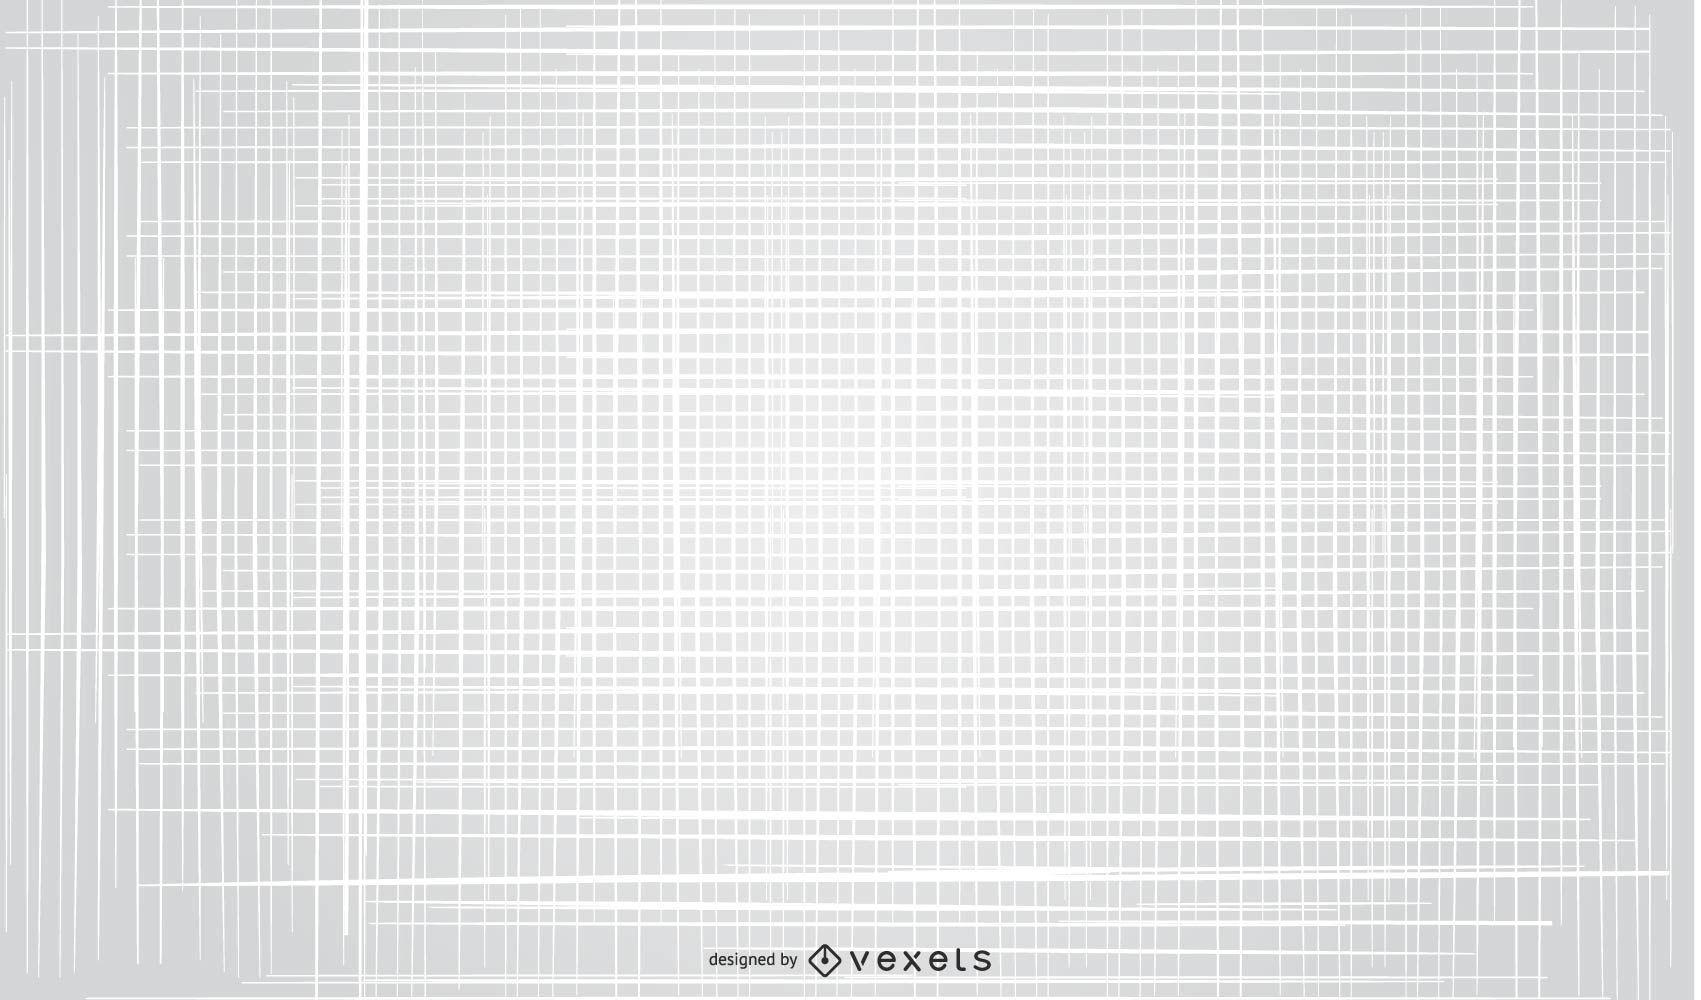 Textura de lino blanco